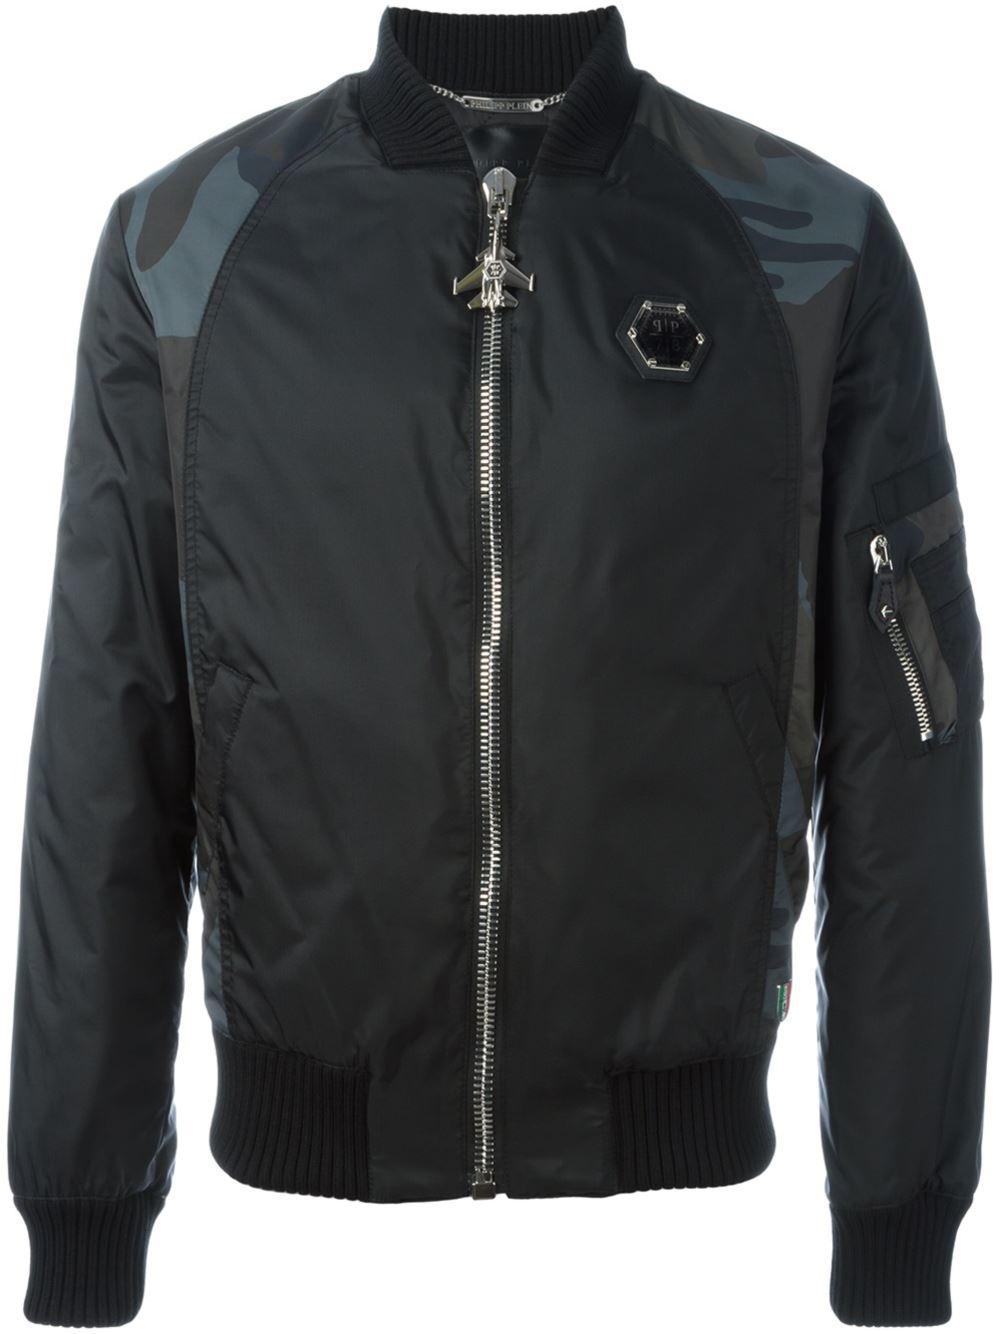 philipp plein 39 brunifoglia 39 bomber jacket in black for men lyst. Black Bedroom Furniture Sets. Home Design Ideas